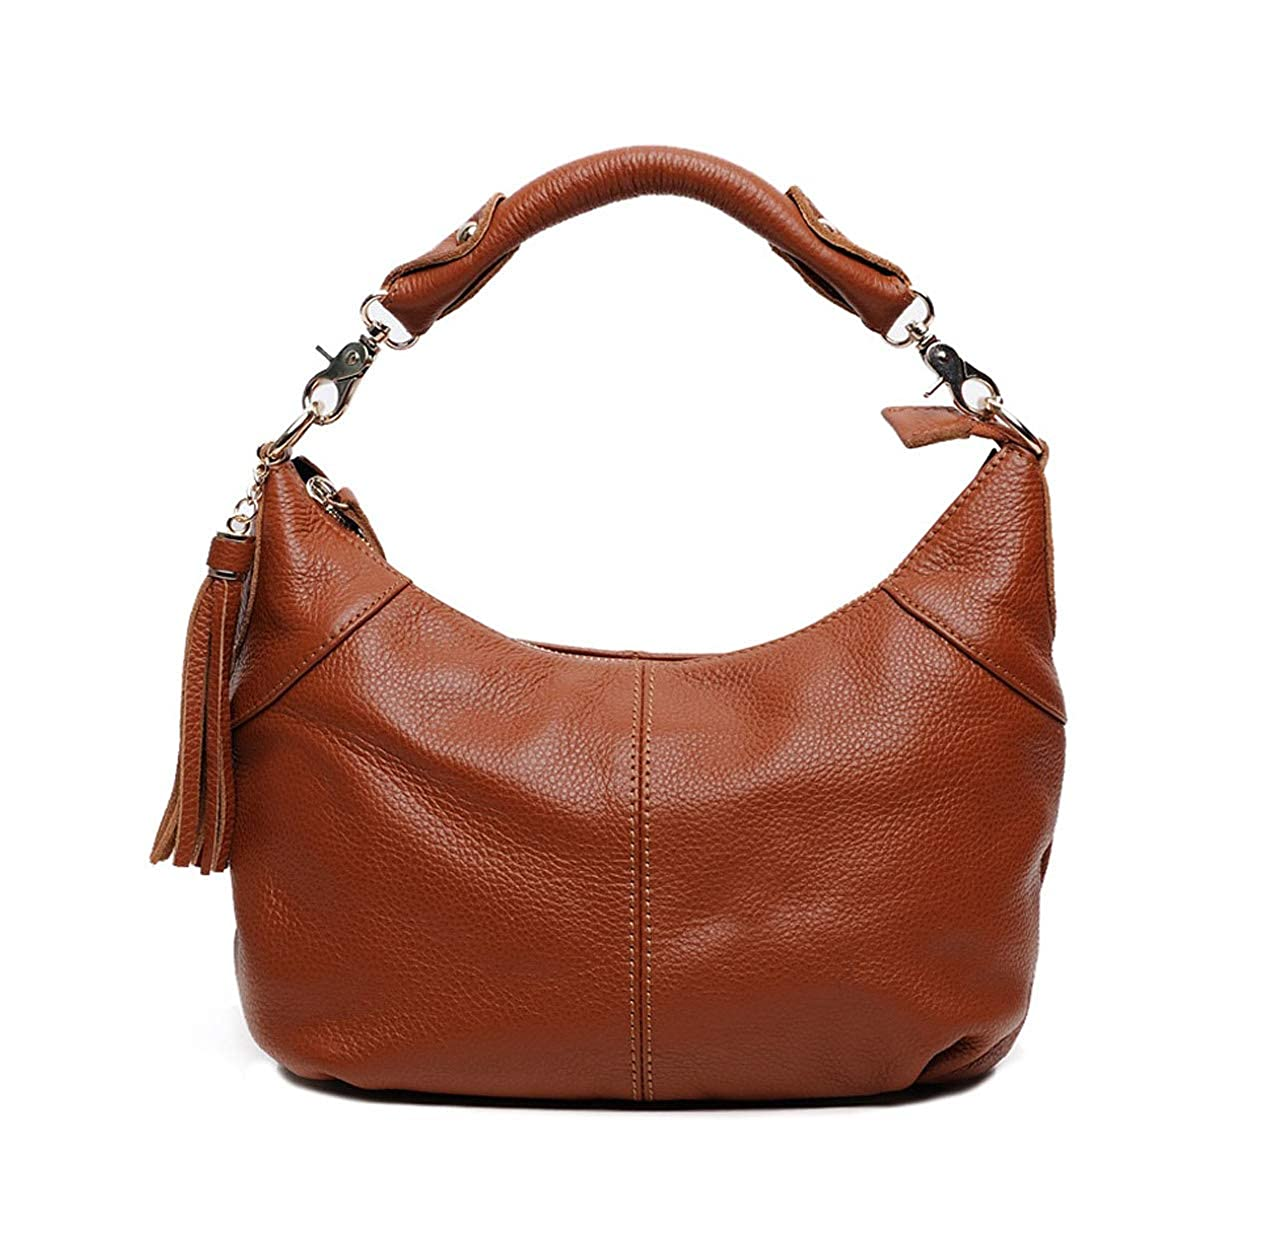 Brown DEERWORD Women's CrossBody Bags Faux Leather Handbags Shoulder Bags TopHandle Bags Mini